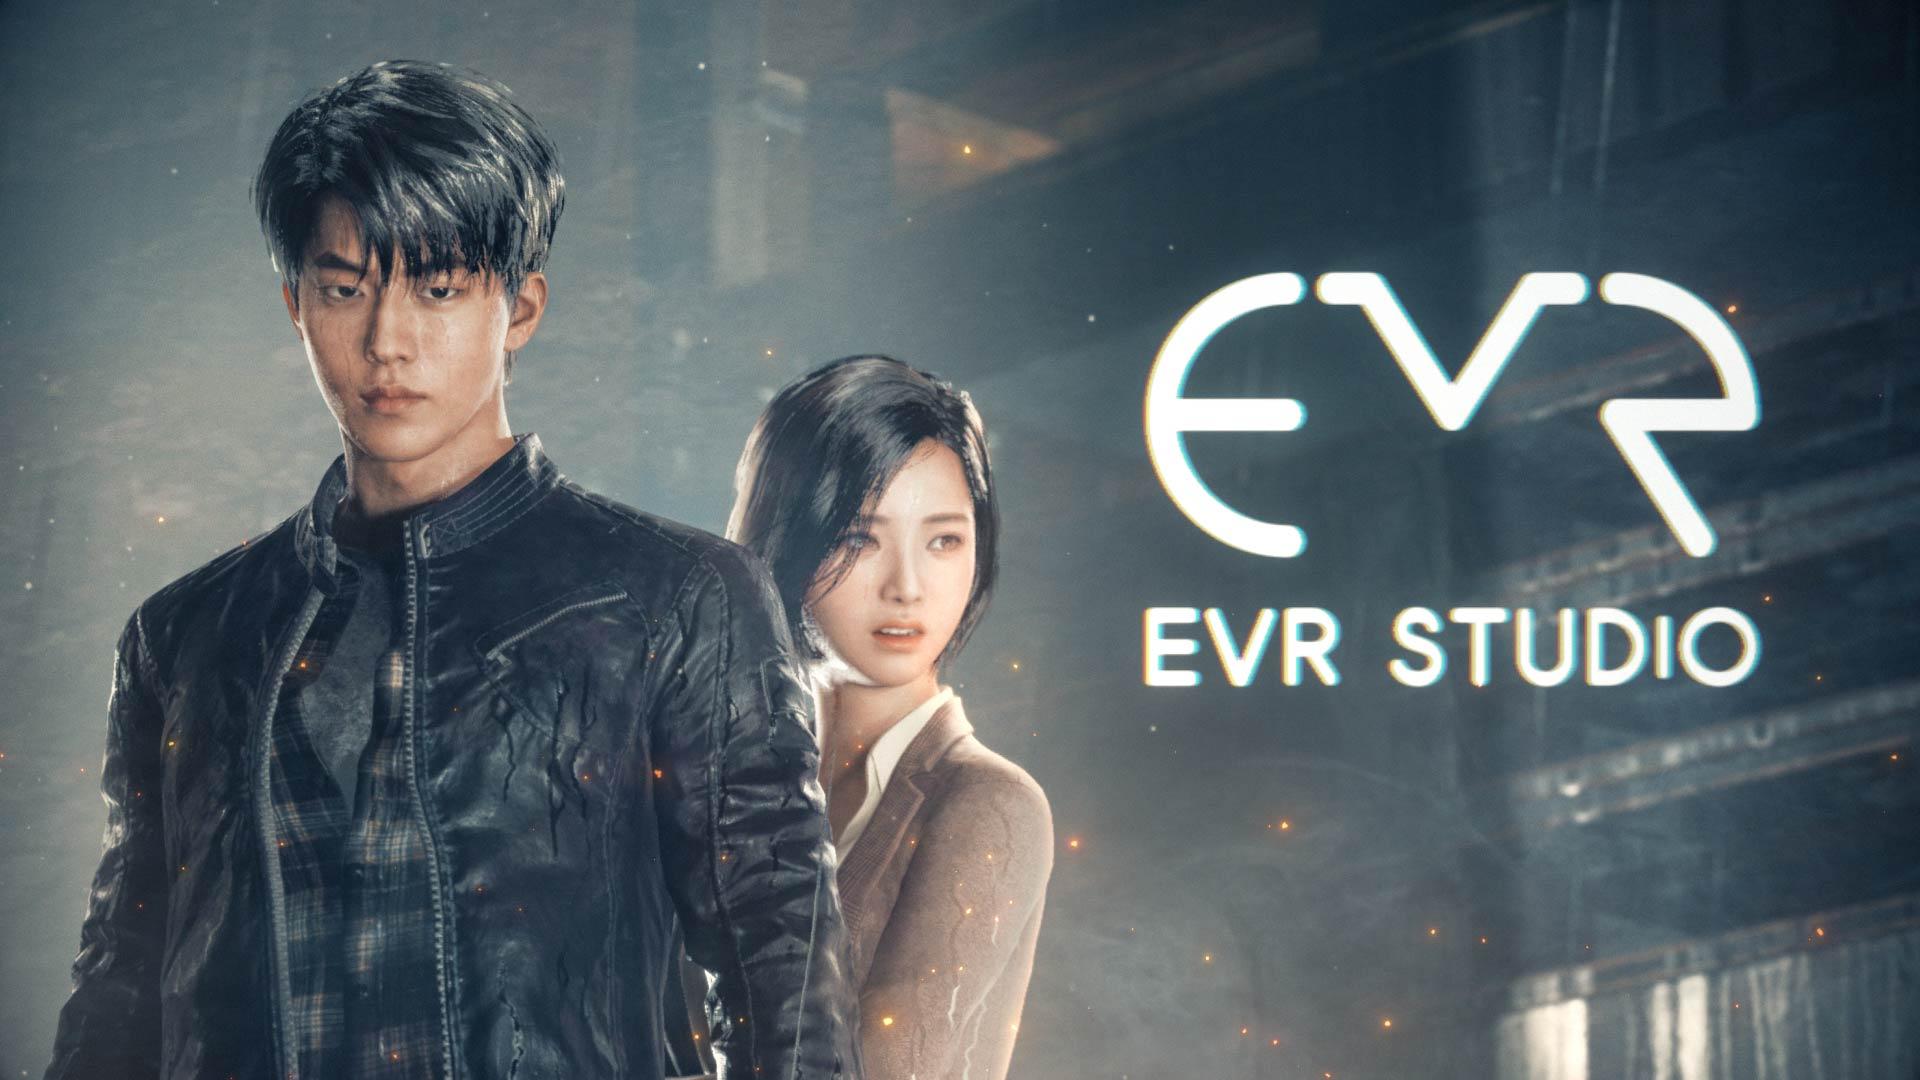 EVR STUDIO 2019